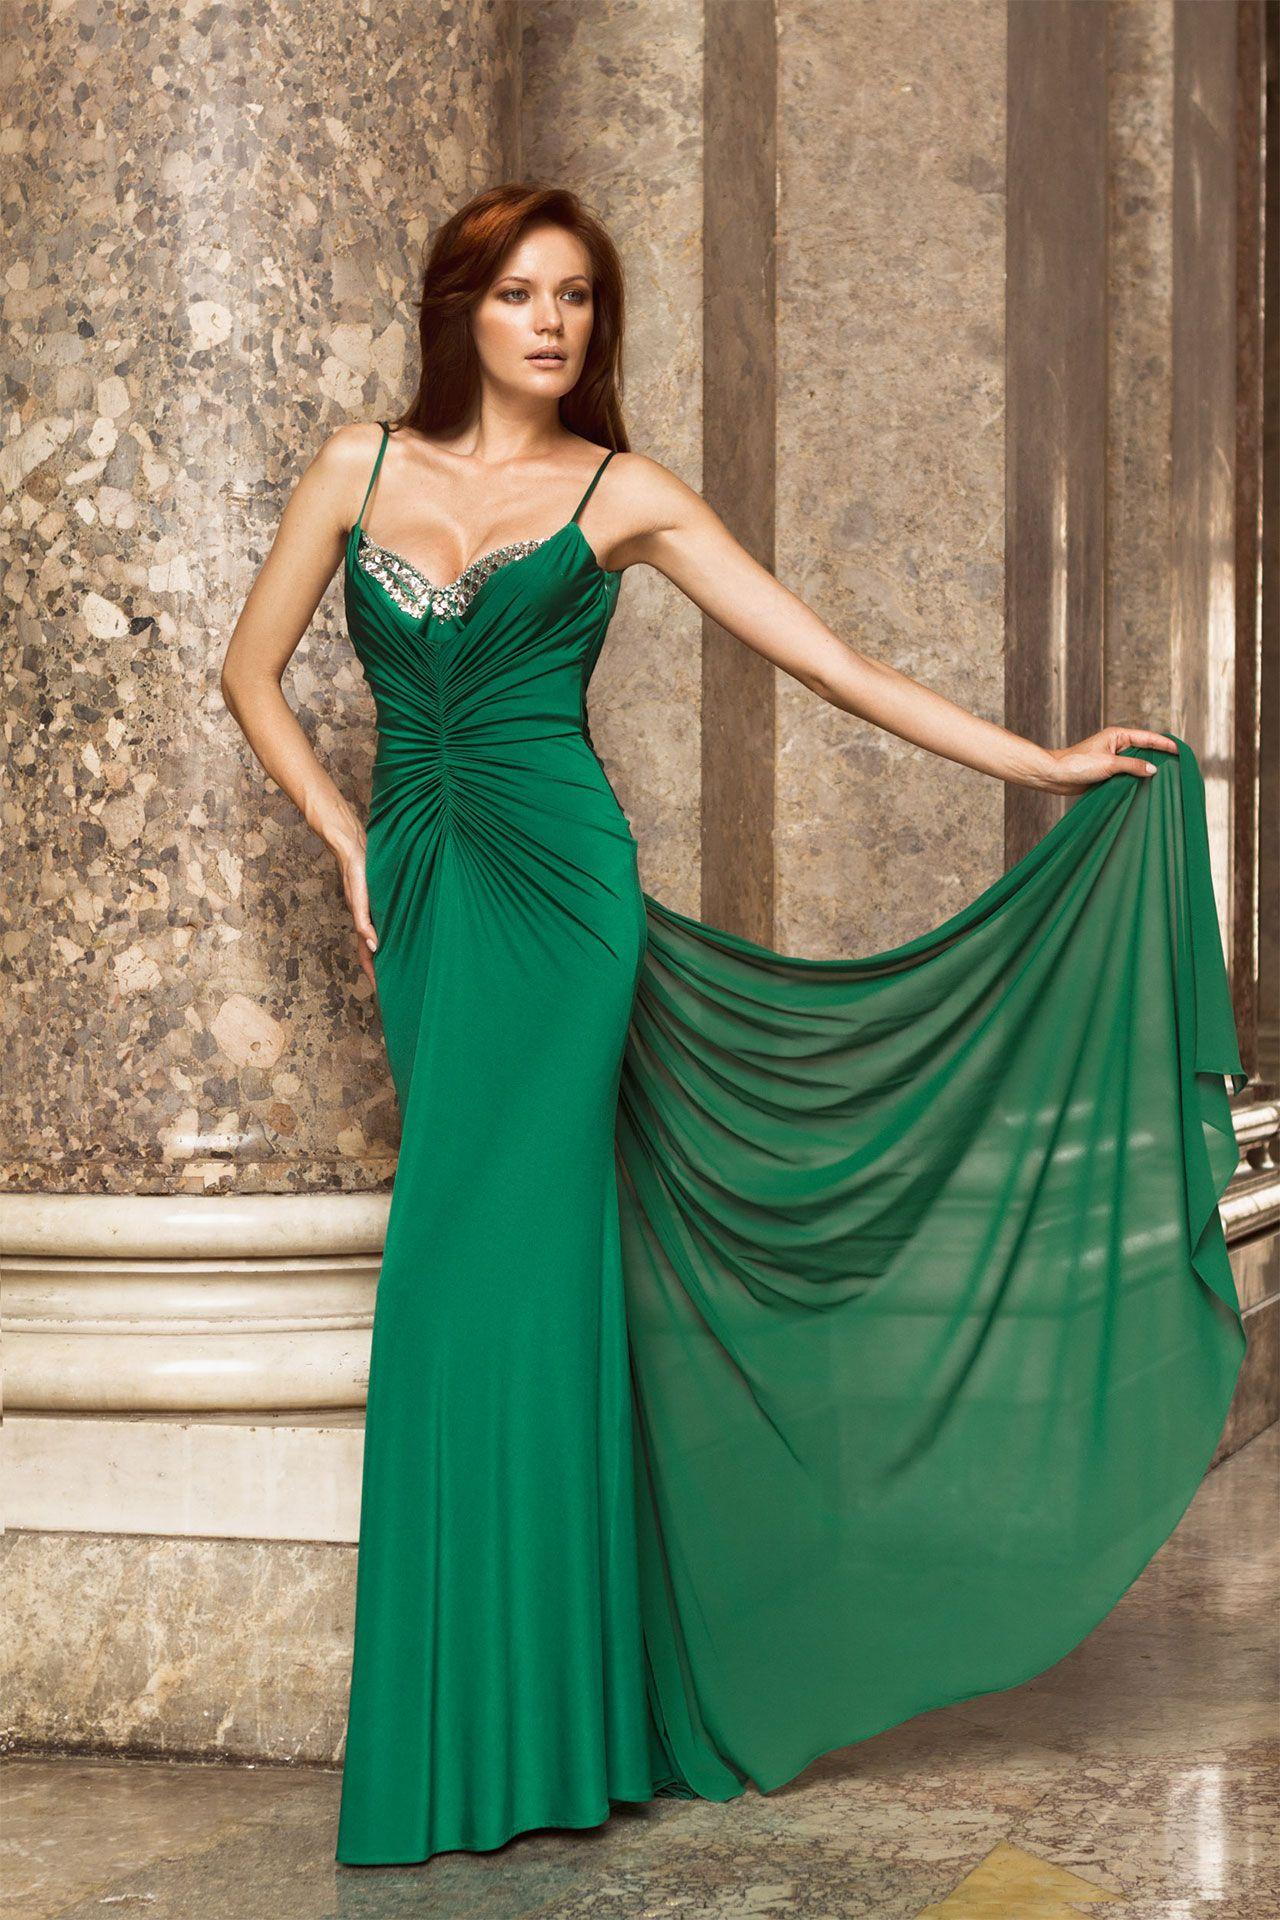 abito  dress  abiti  cerimonia  ceremony  sera  cocktaildress  partydress   damigella  redcarpetdress  bridesmaid  bridesmaiddres  verde  green a75b111cf6b